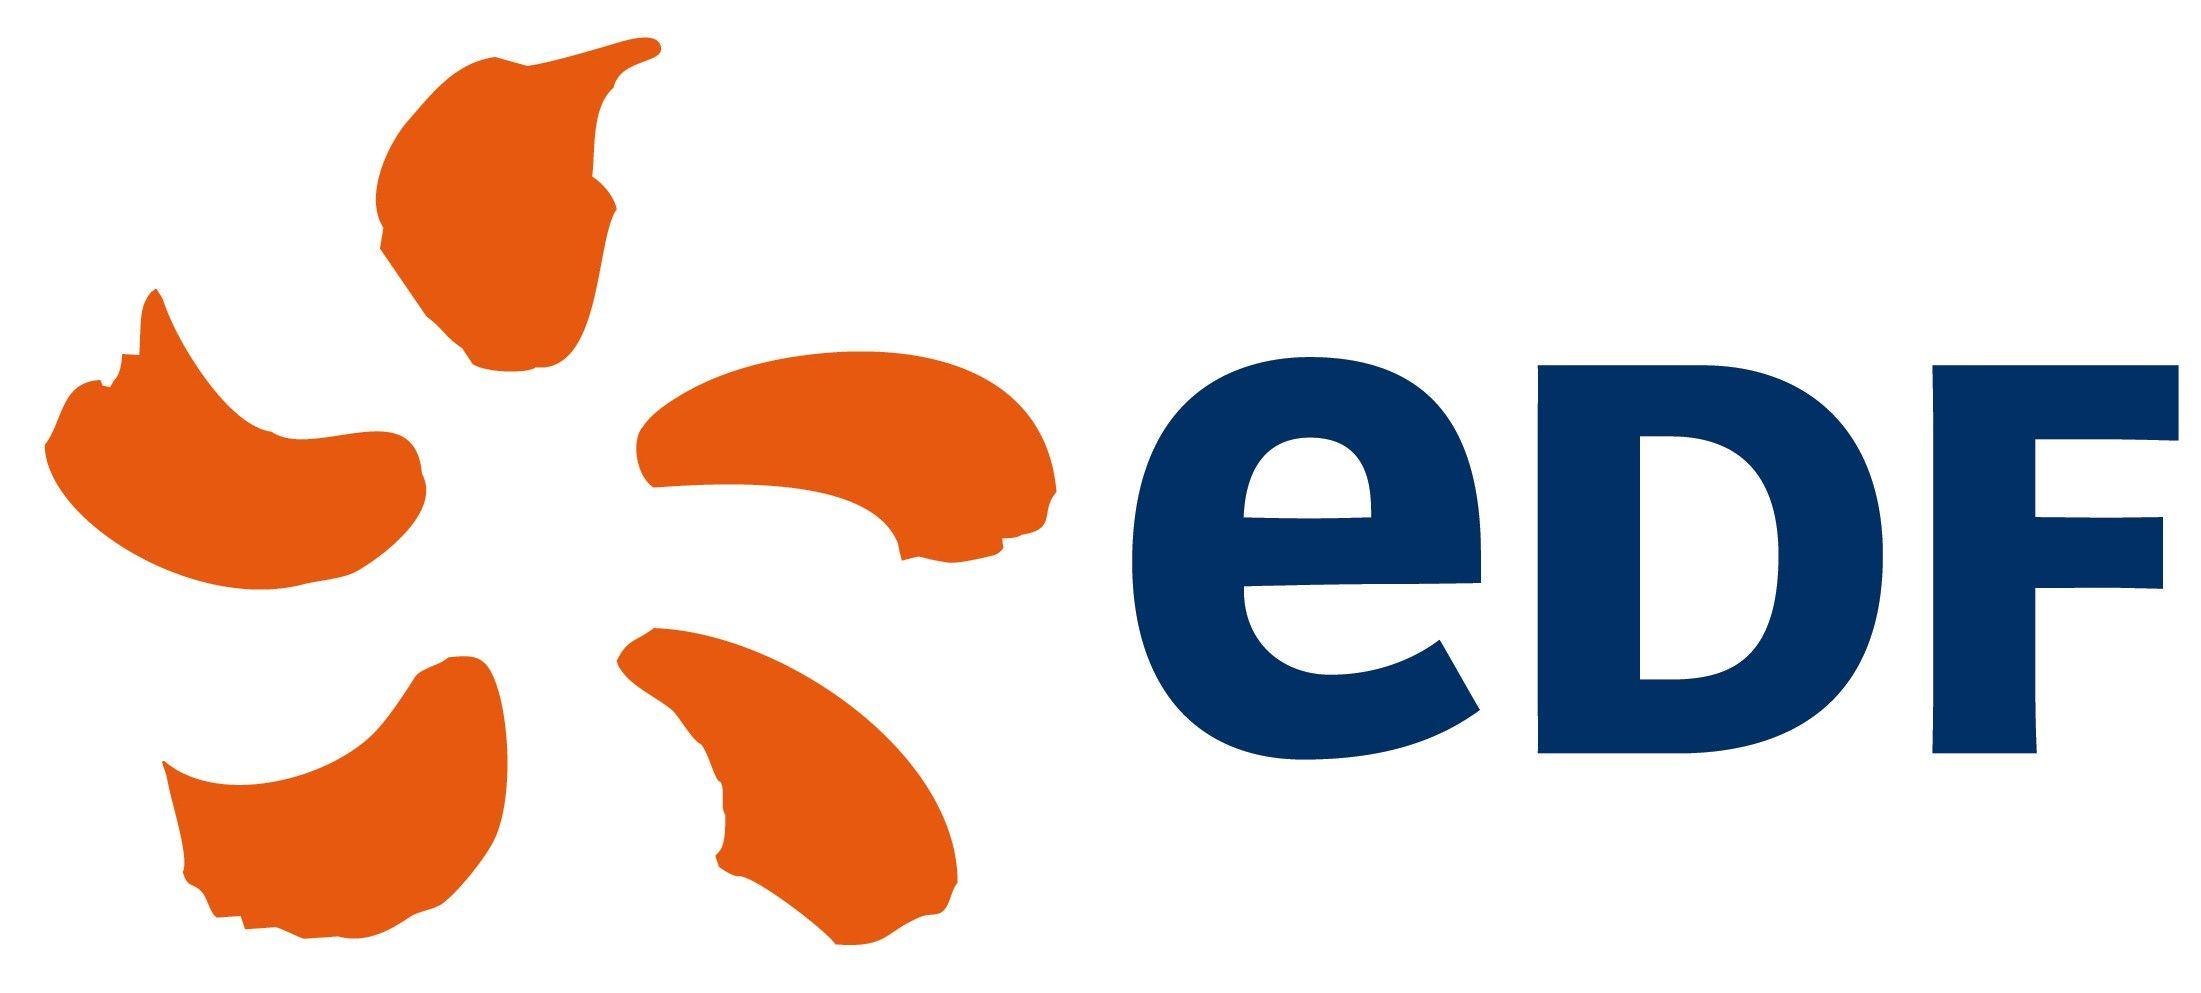 Newsroom Logos, Best logos ever, Energy logo